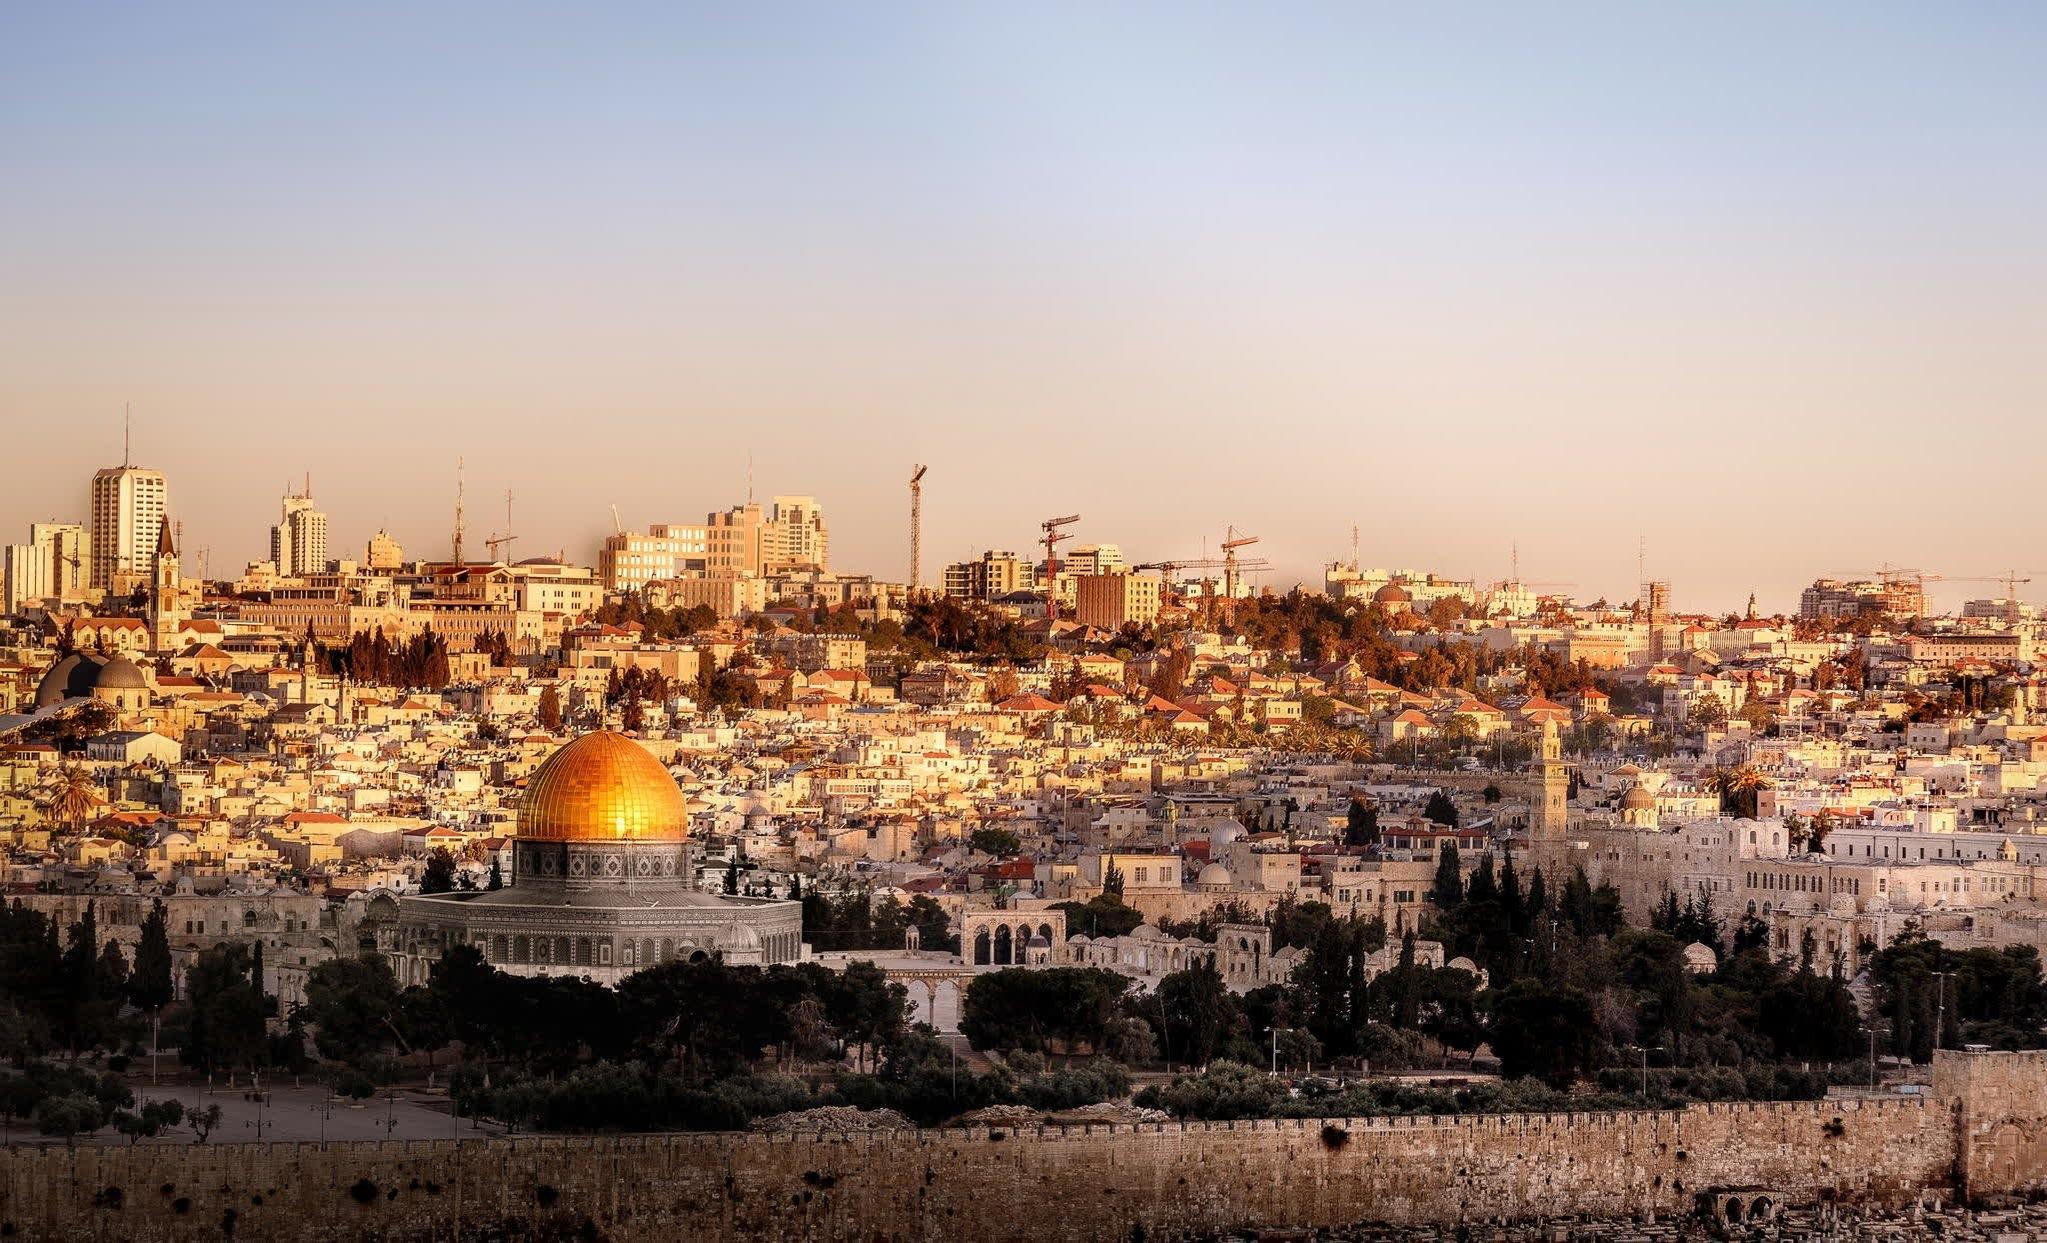 Os 70 anos de Israel, a promessa divina e os grandes desafios